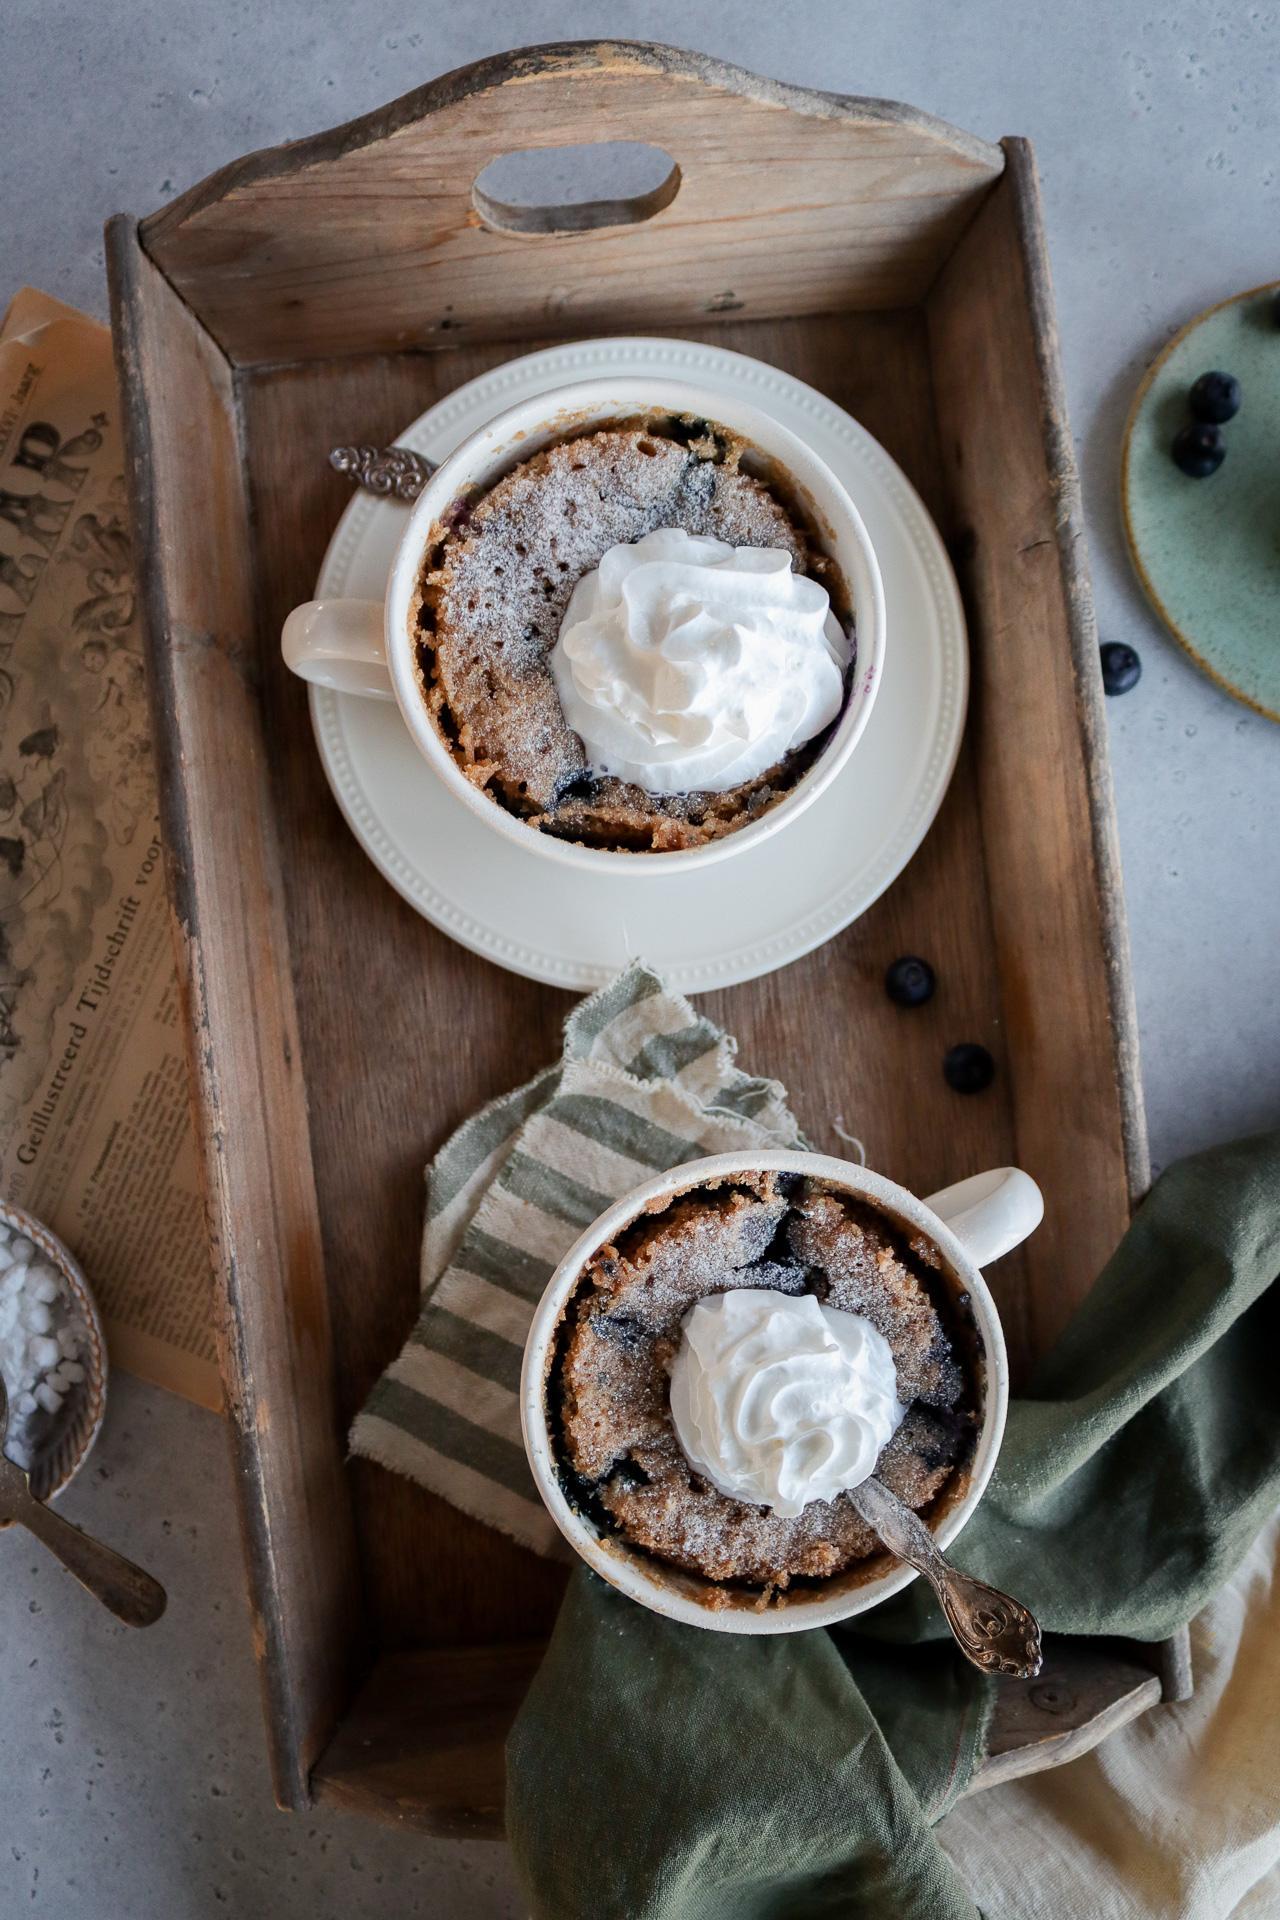 Main image of Vegan Blueberry Mug Cake